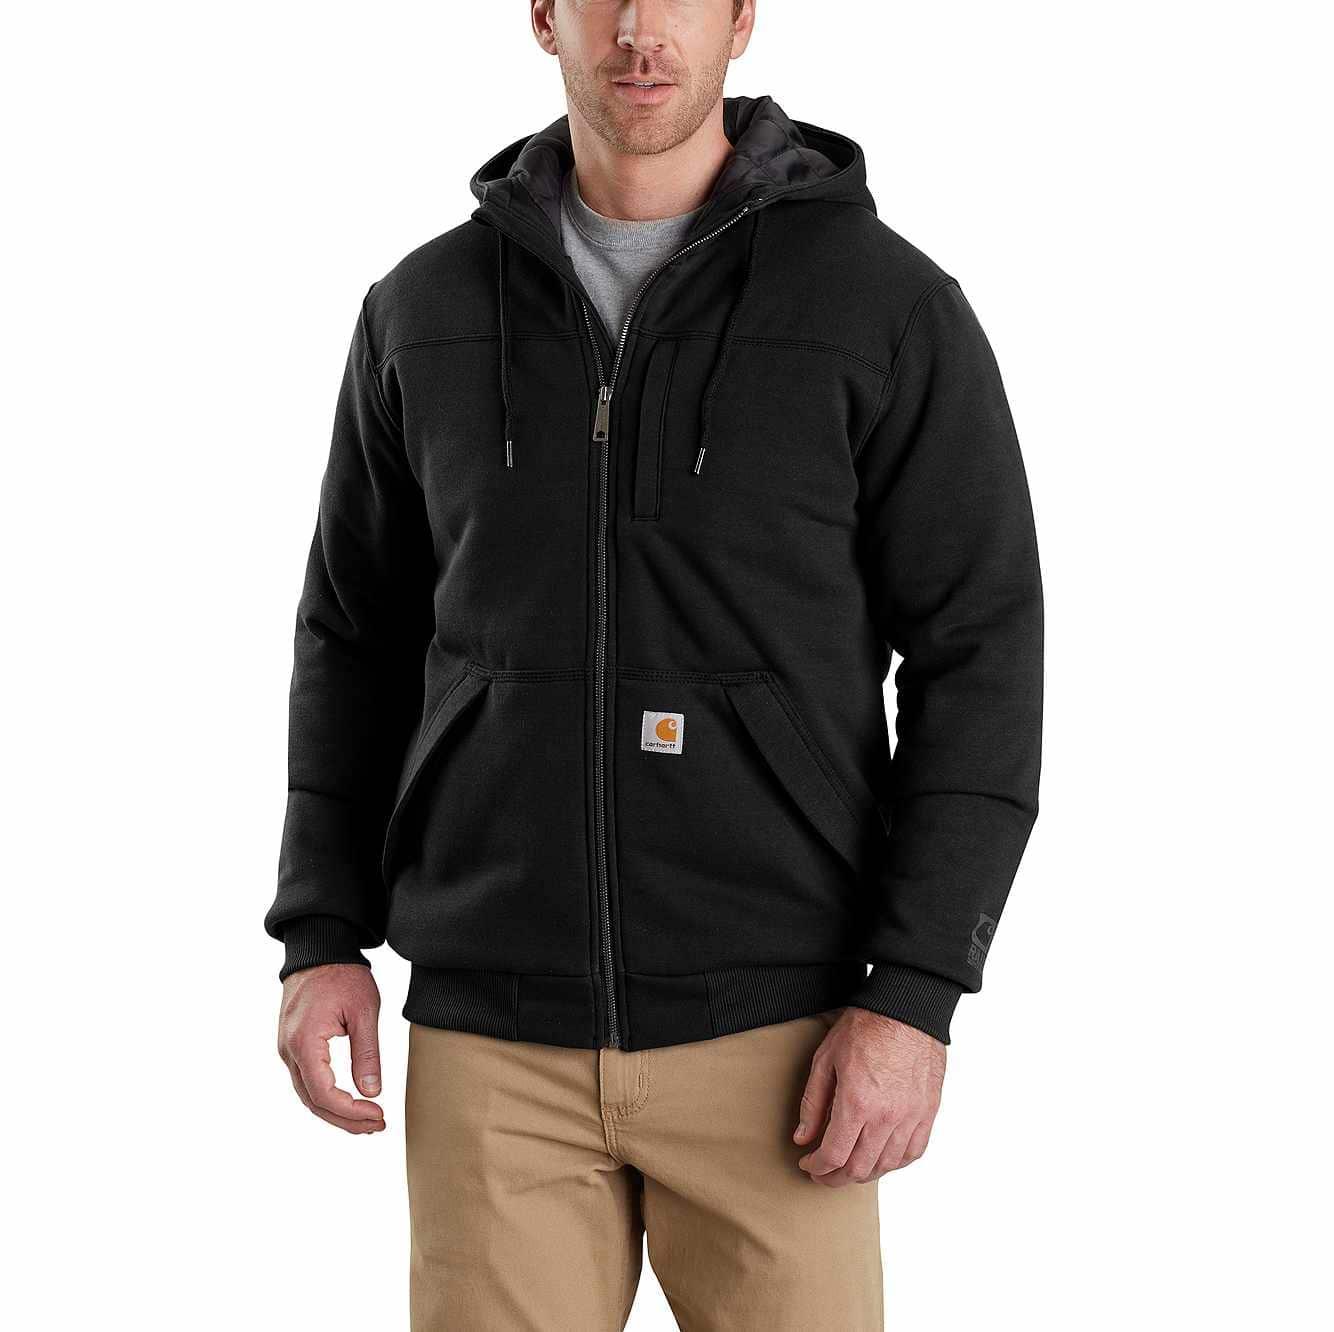 Picture of Rain Defender ® Rockland Quilt-Lined Full-Zip Hooded Sweatshirt in Black